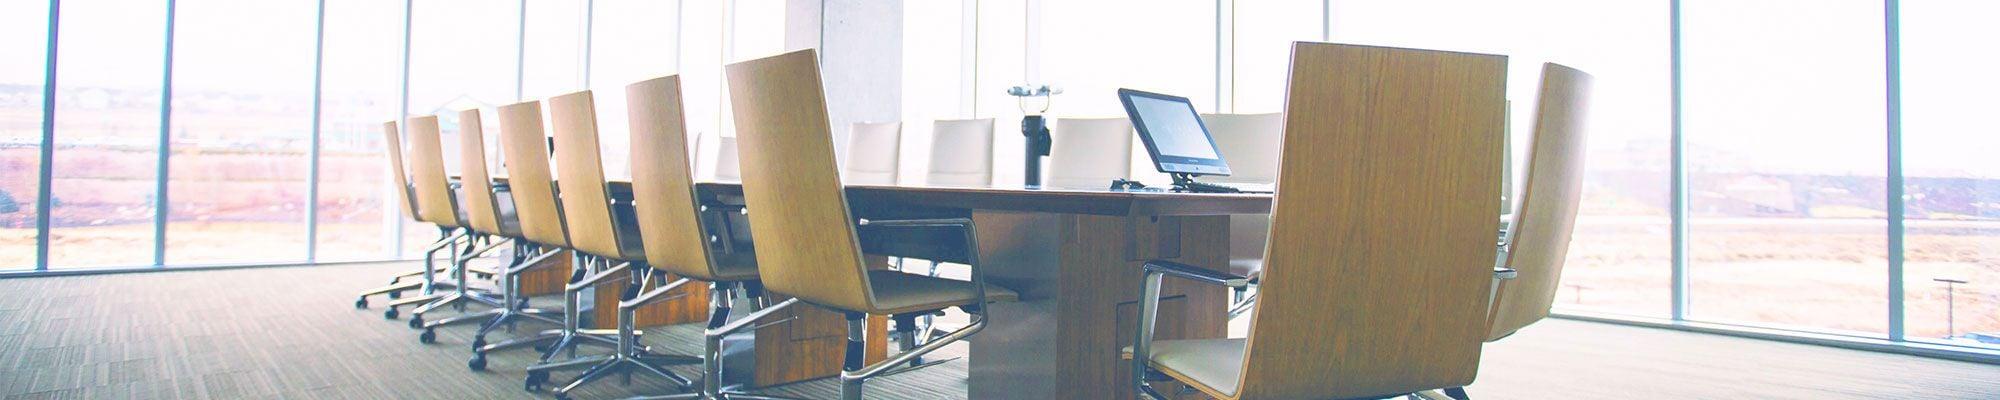 Performance Management Training Courses